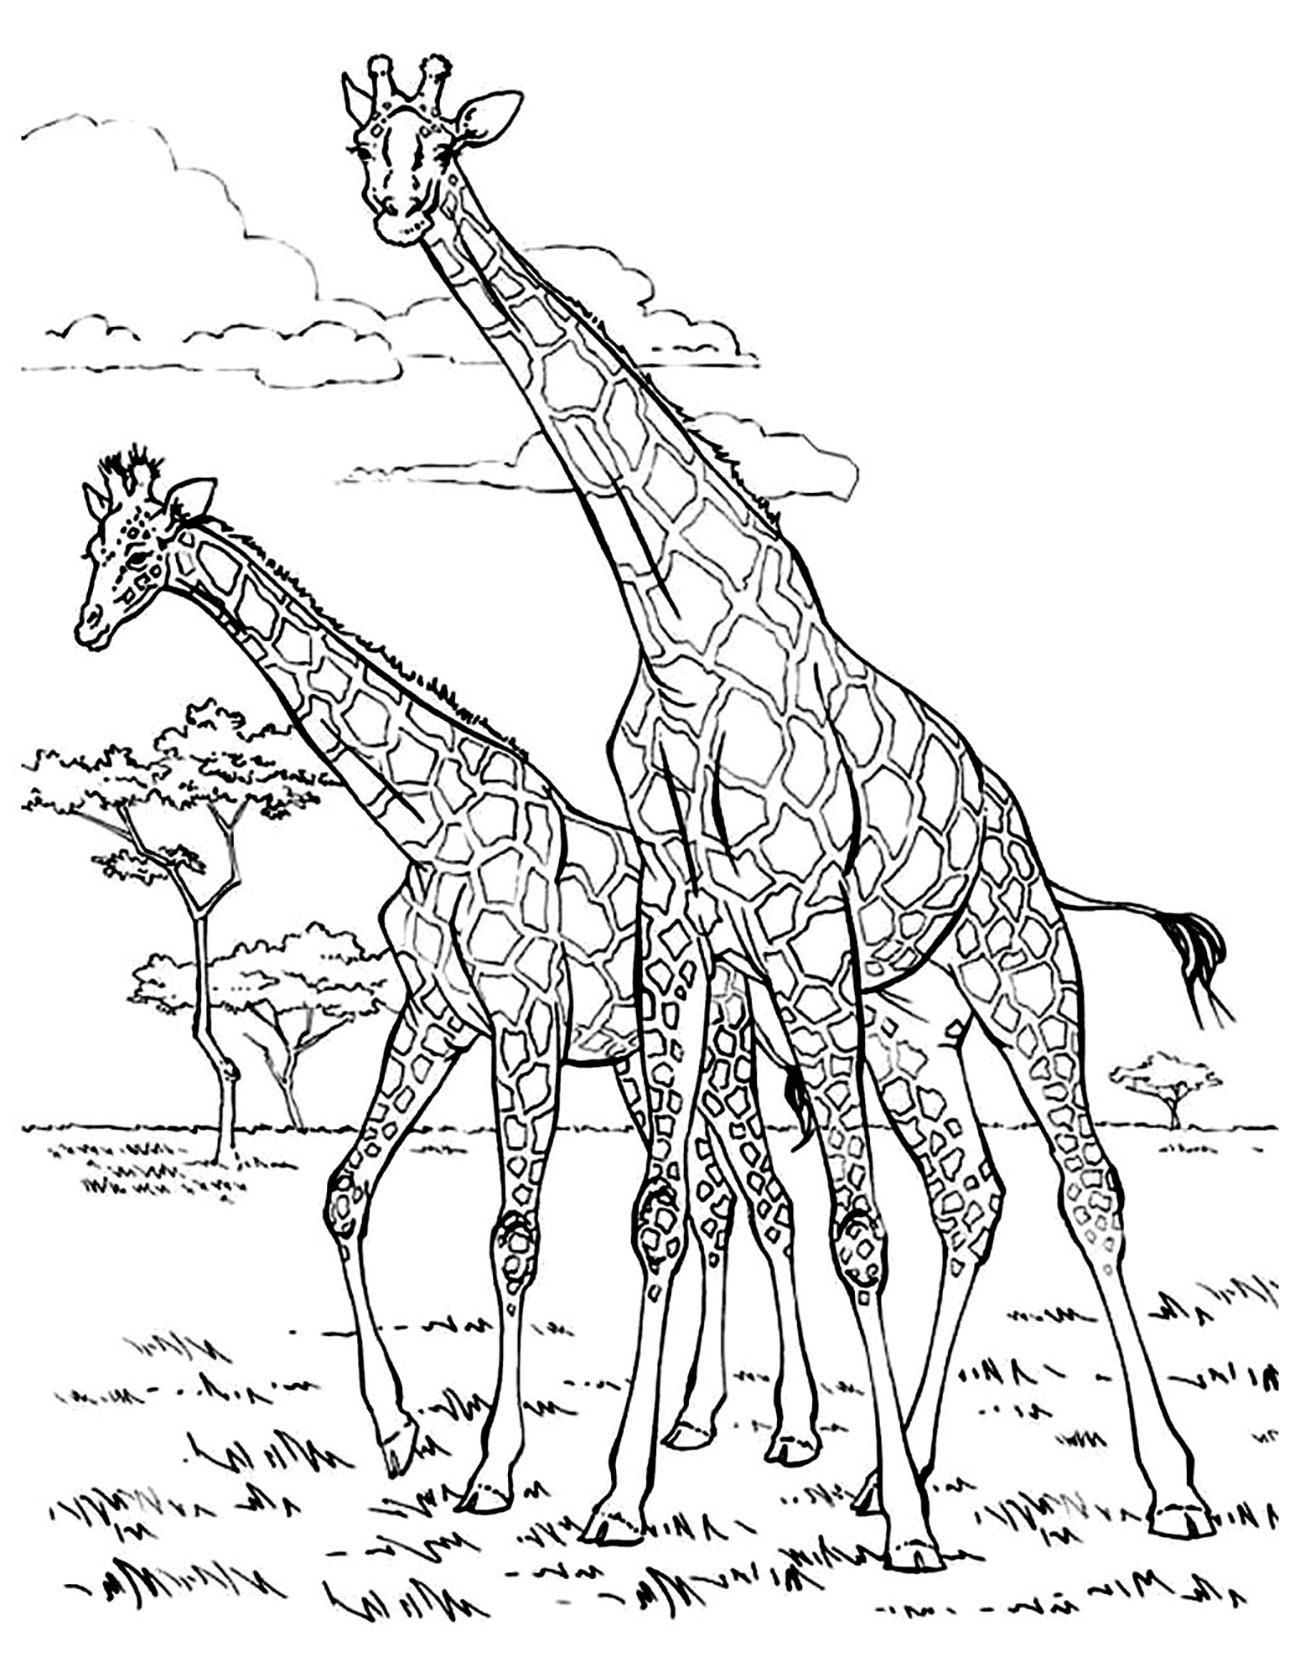 Giraffen 63919 - Giraffen - Malbuch Fur Erwachsene